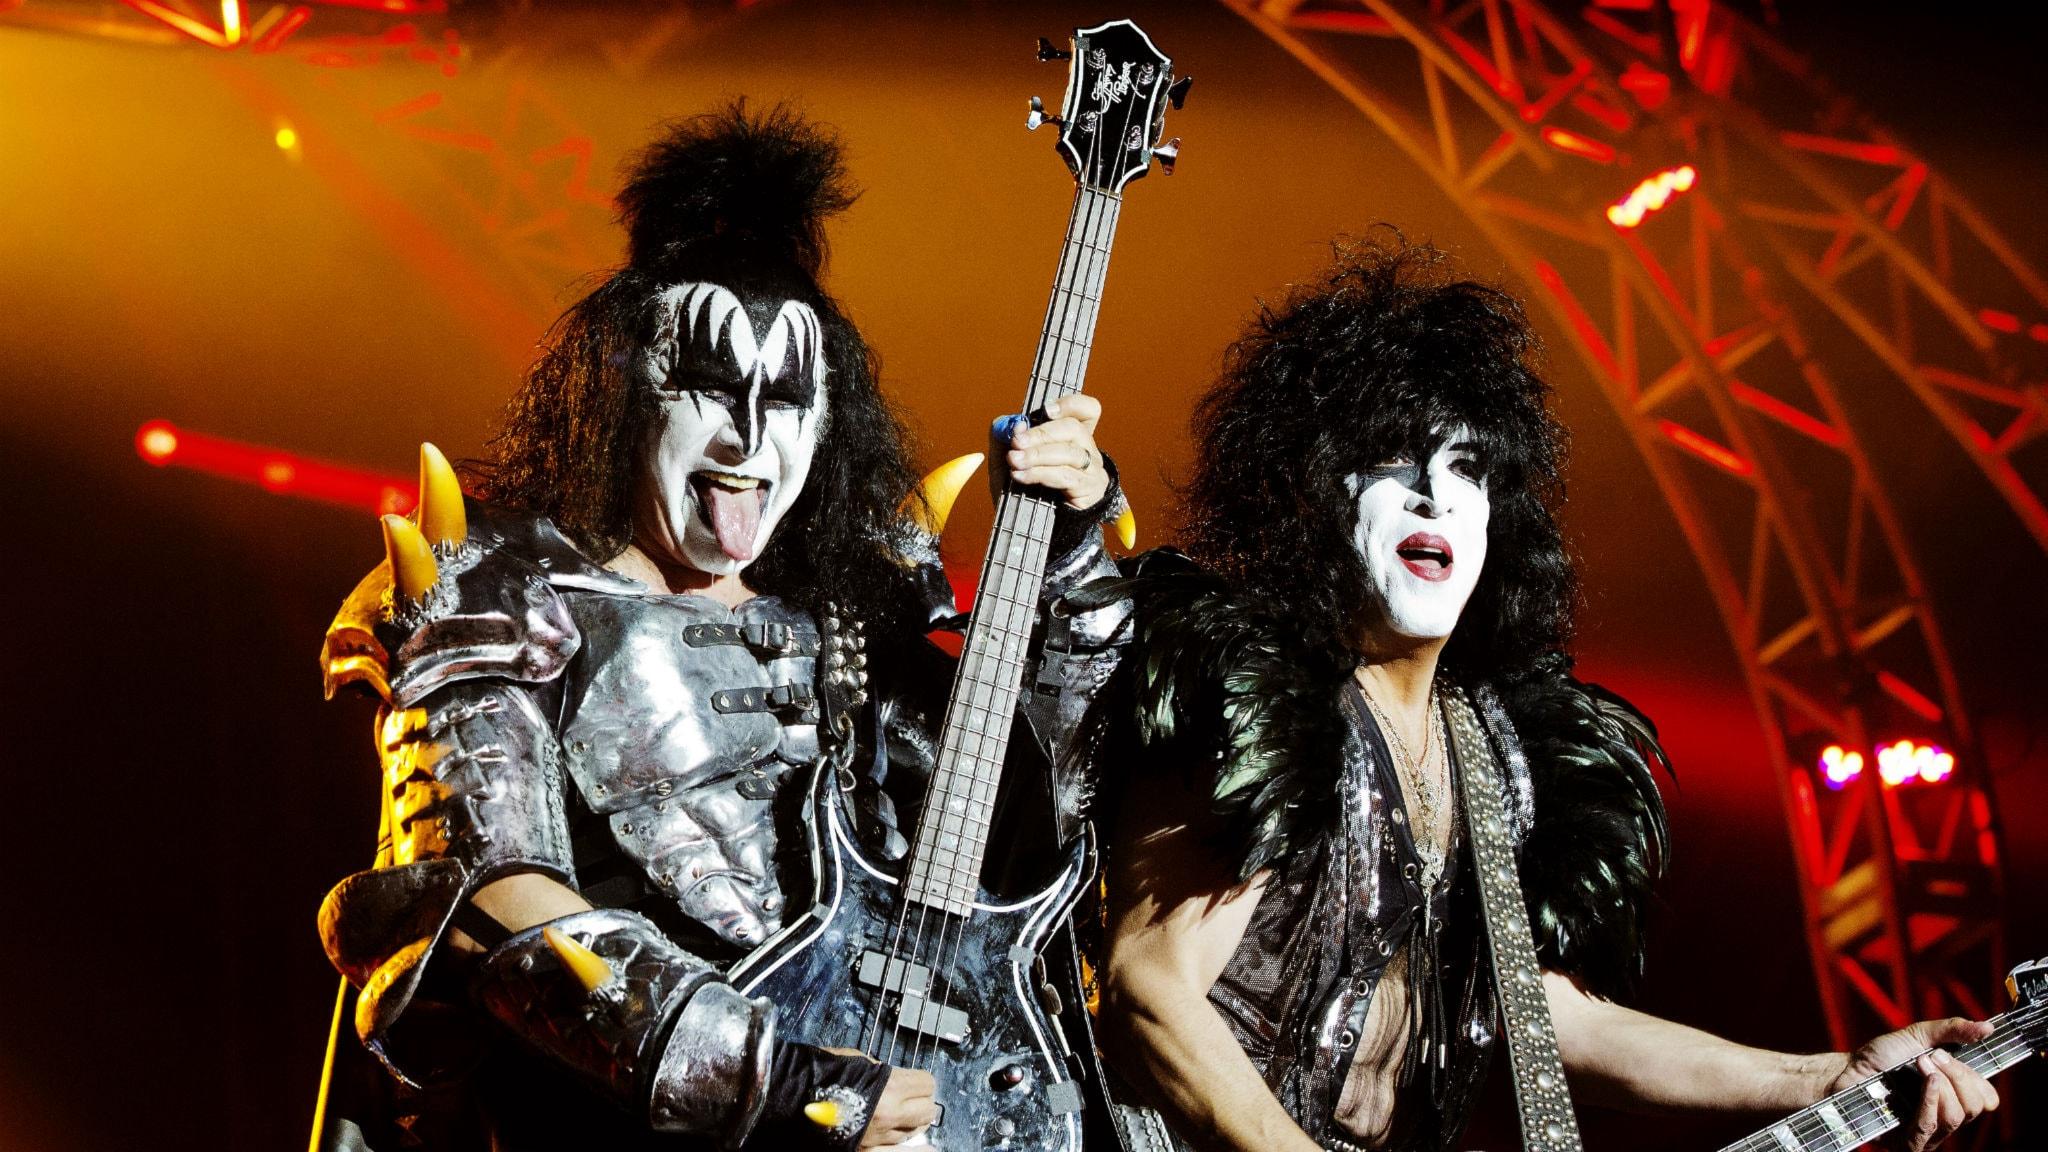 Himlen stod i brann tack vare Kiss 1984